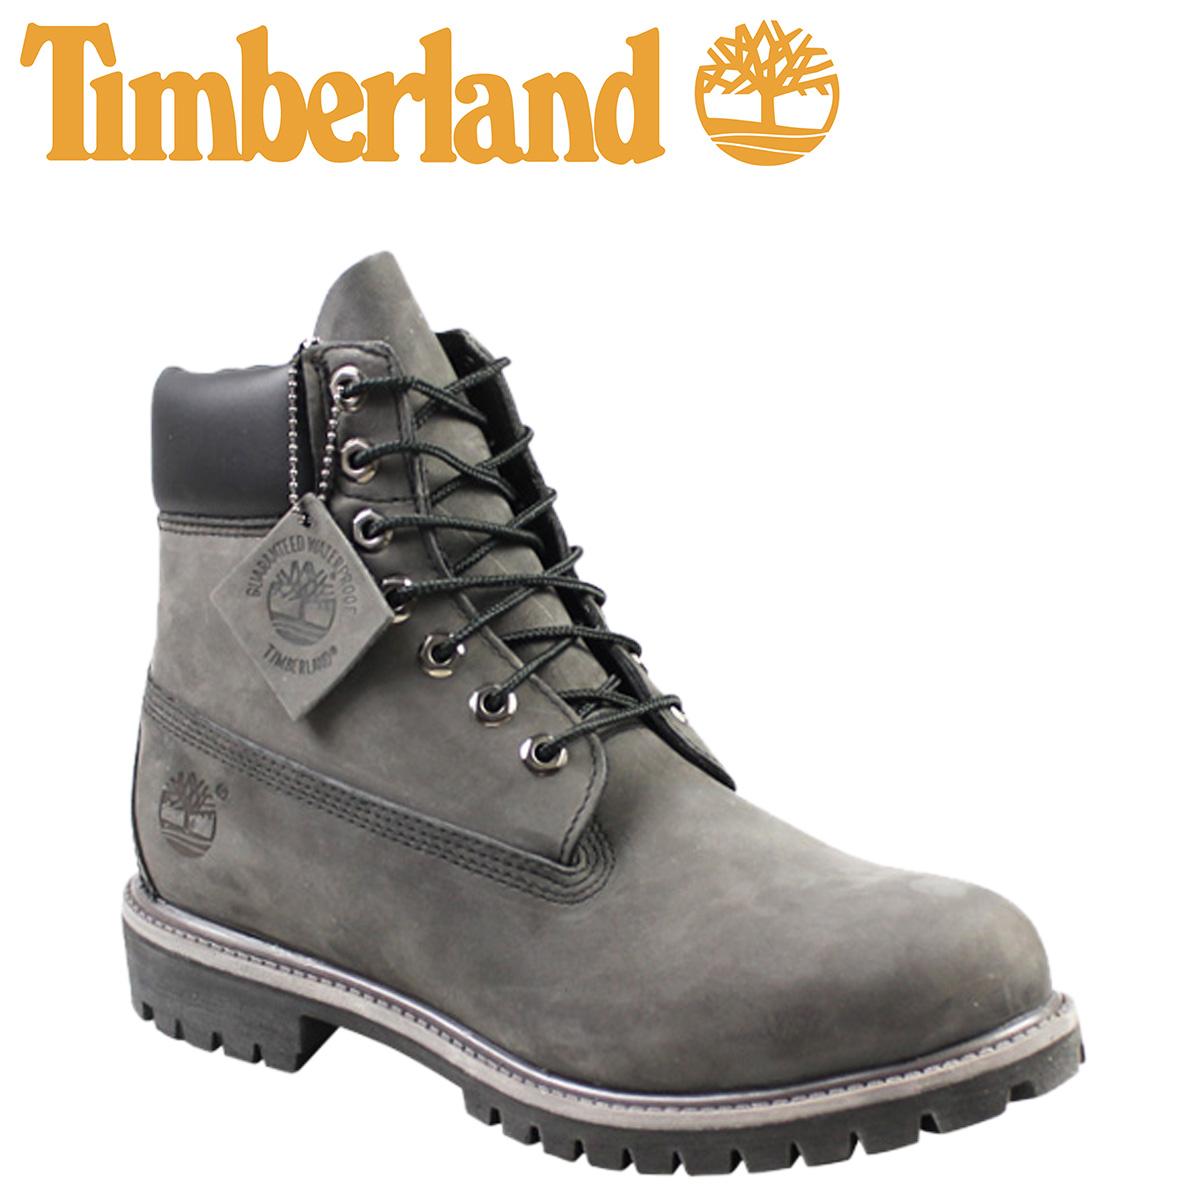 timberland 6 inch waterproof boots grey